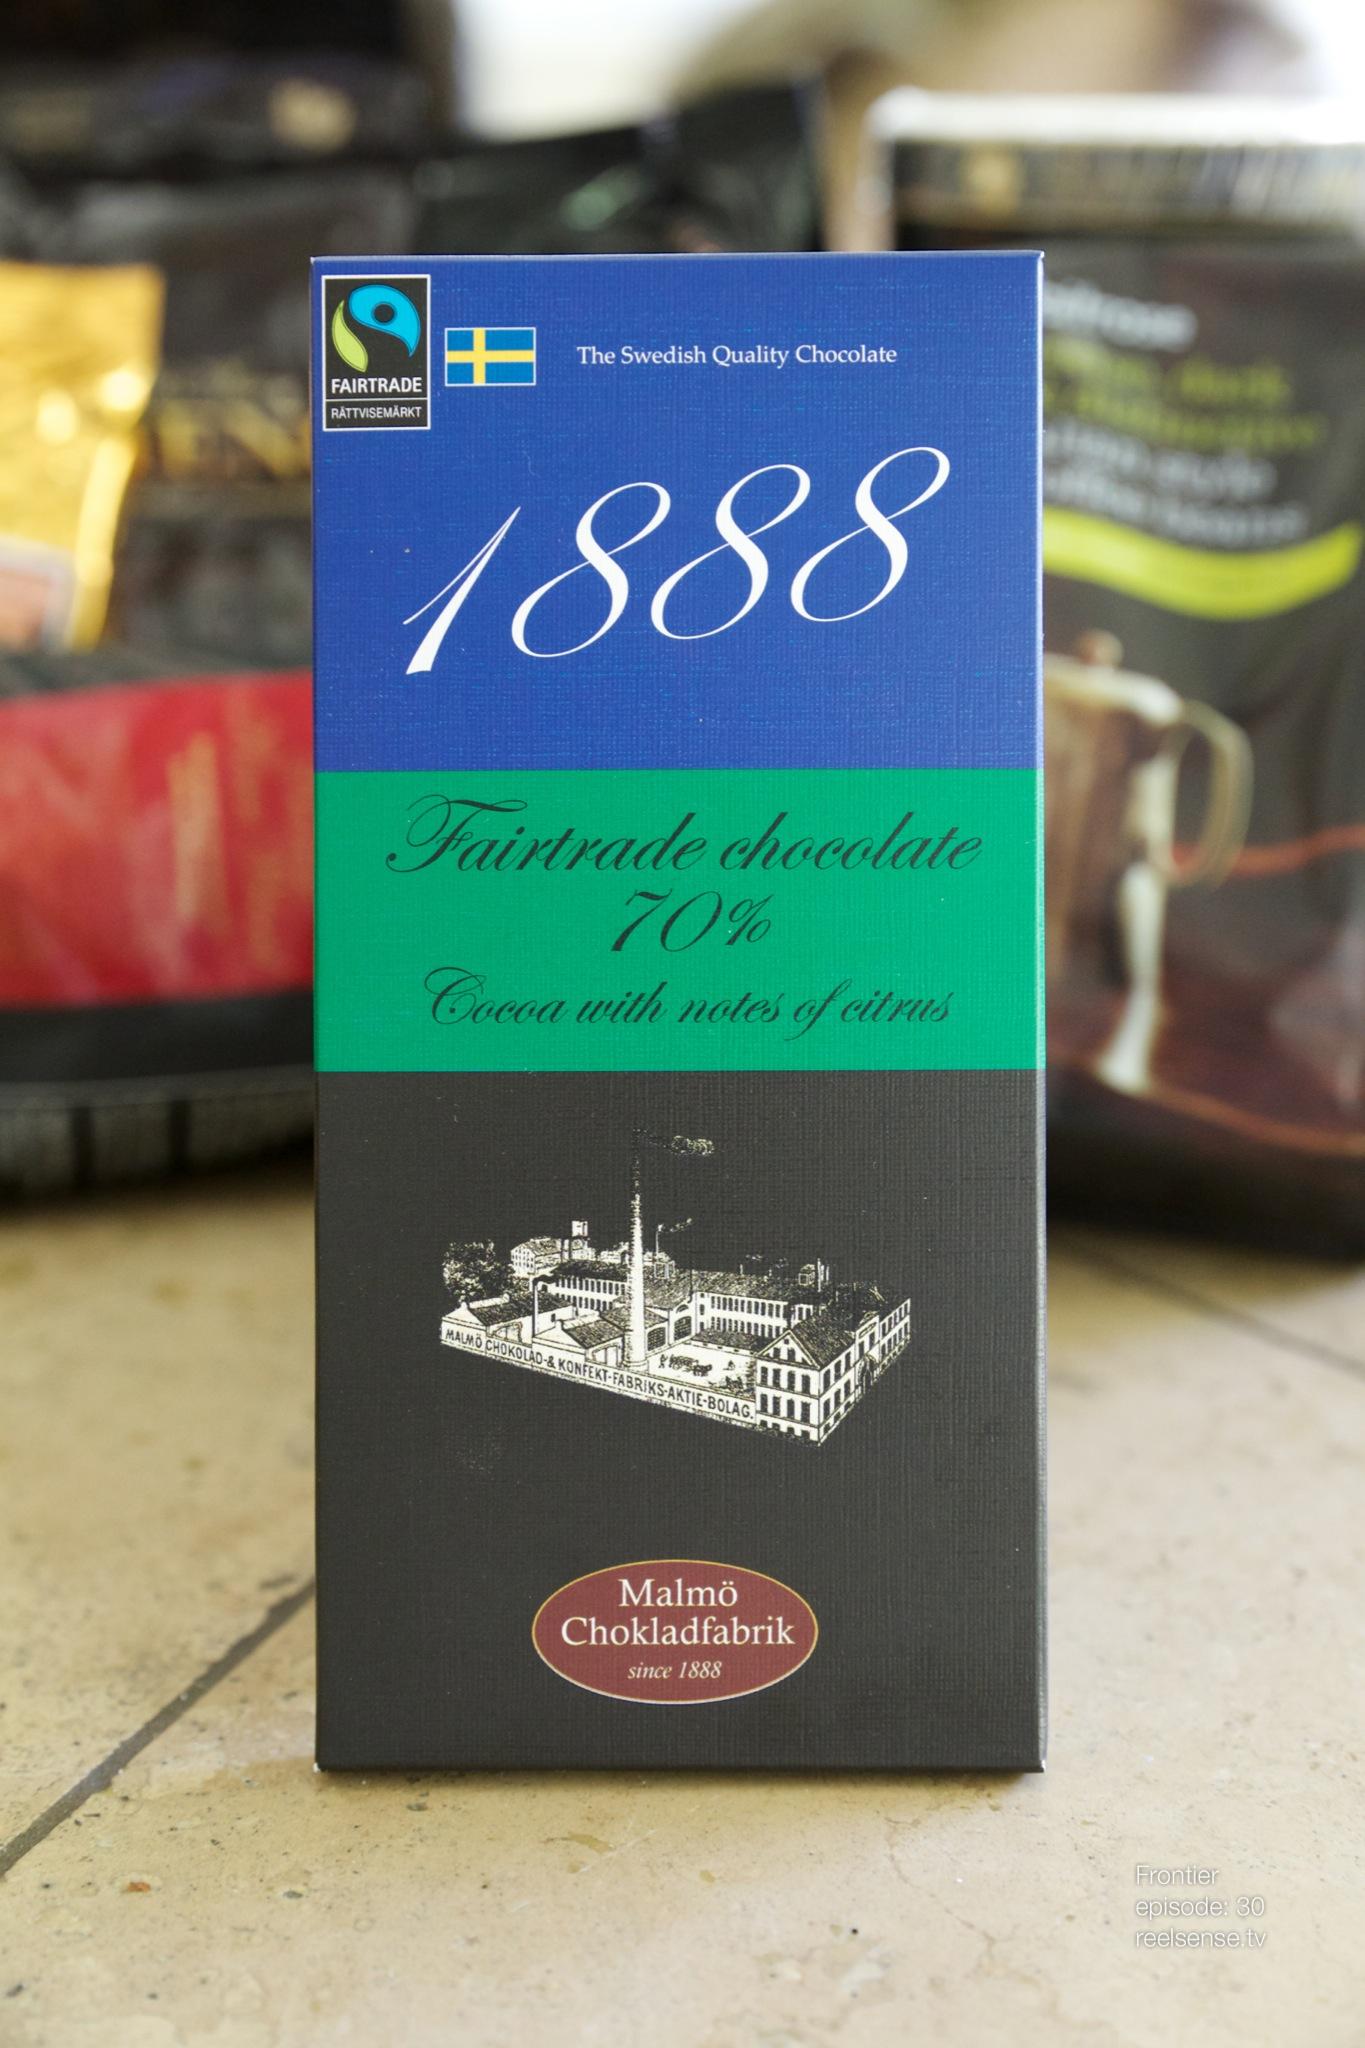 Malmö Chokladfabrik - 1888 70% Cocoa - Sweden